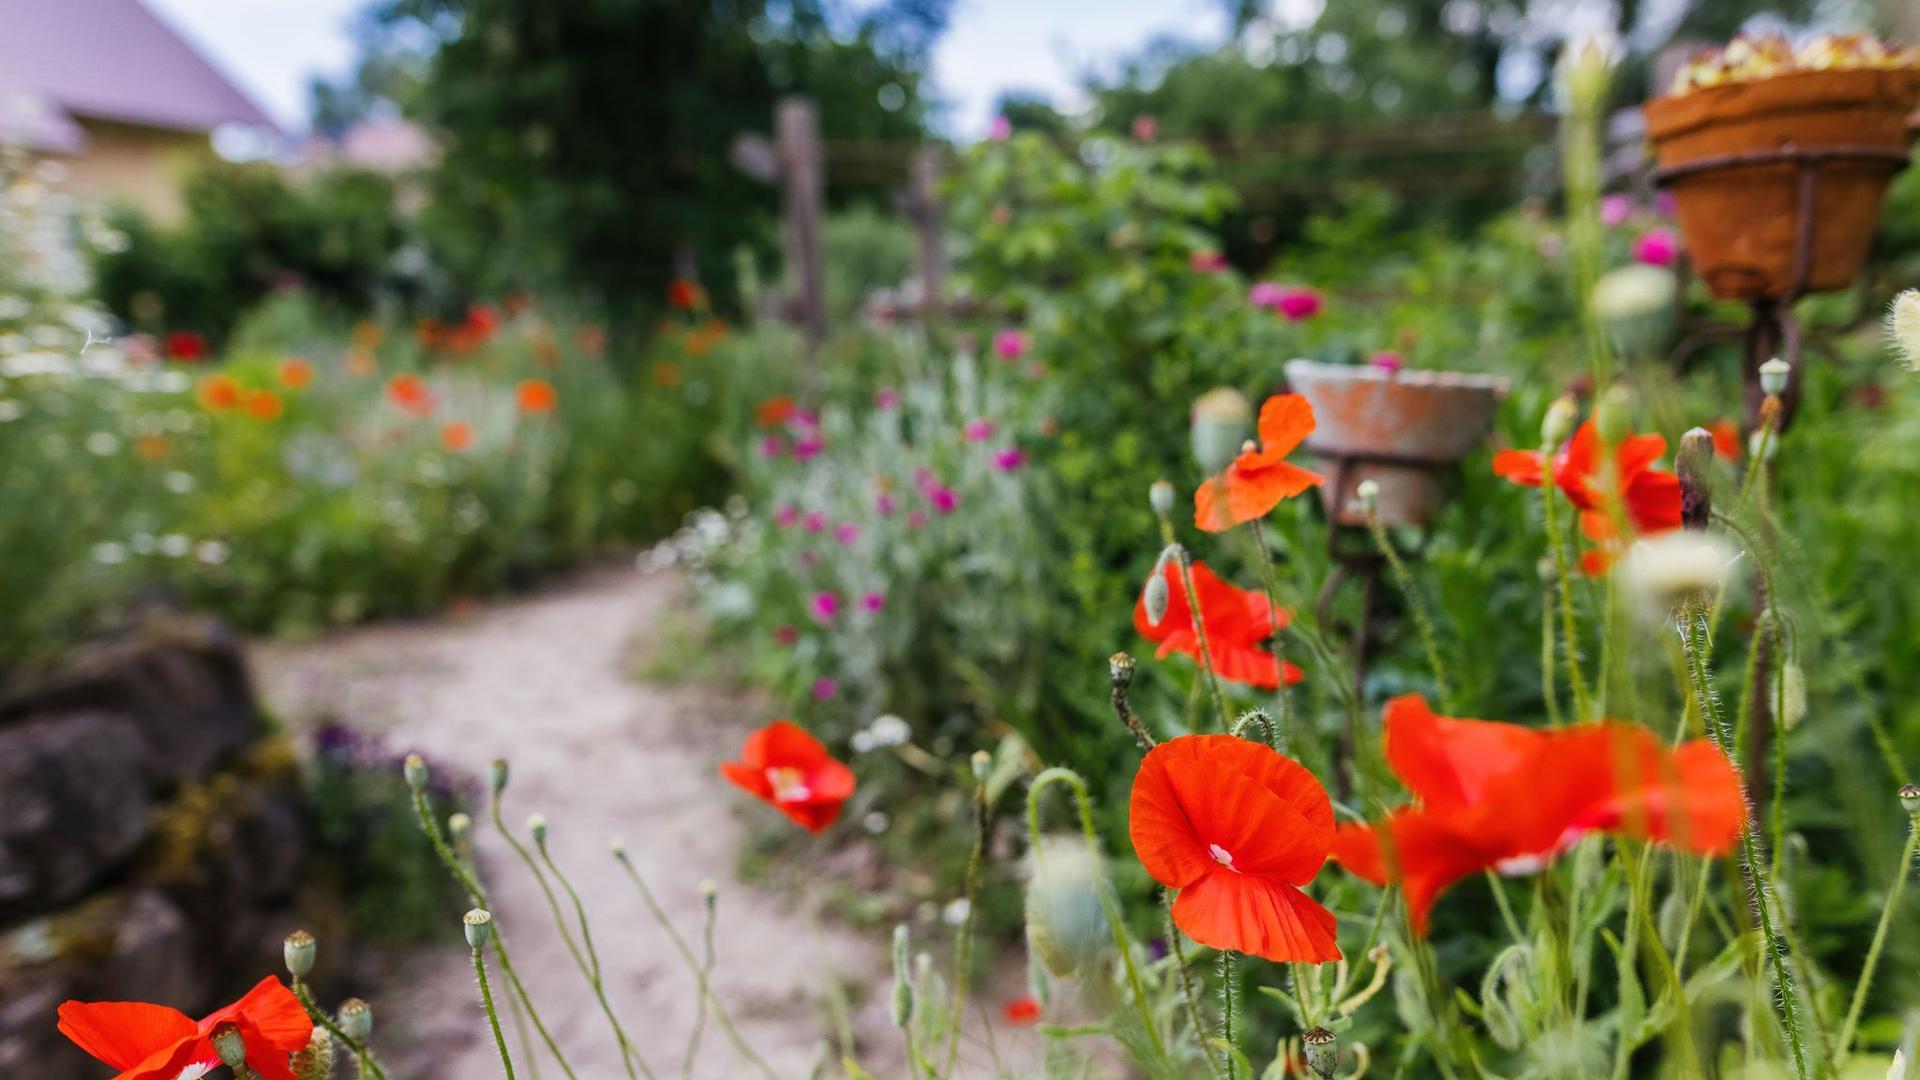 Klatschmohn blüht in einem Garten.